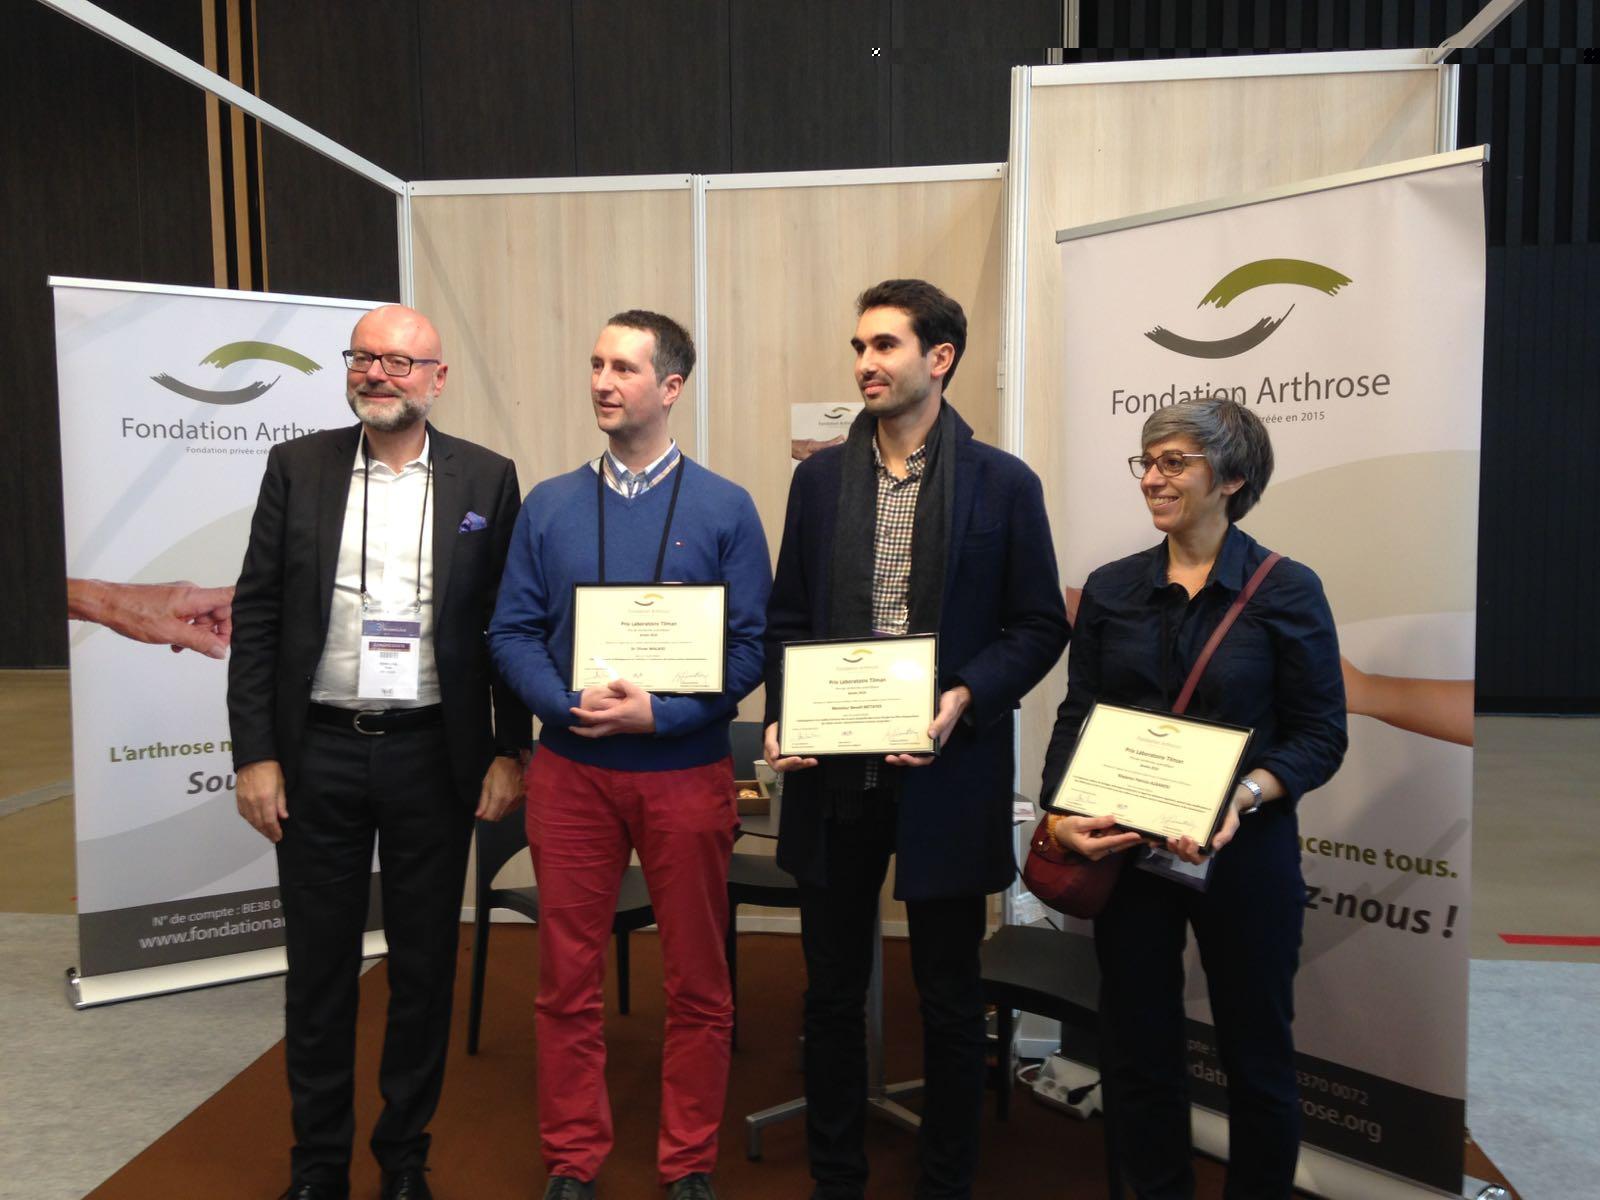 Prix Fondation Arthrose